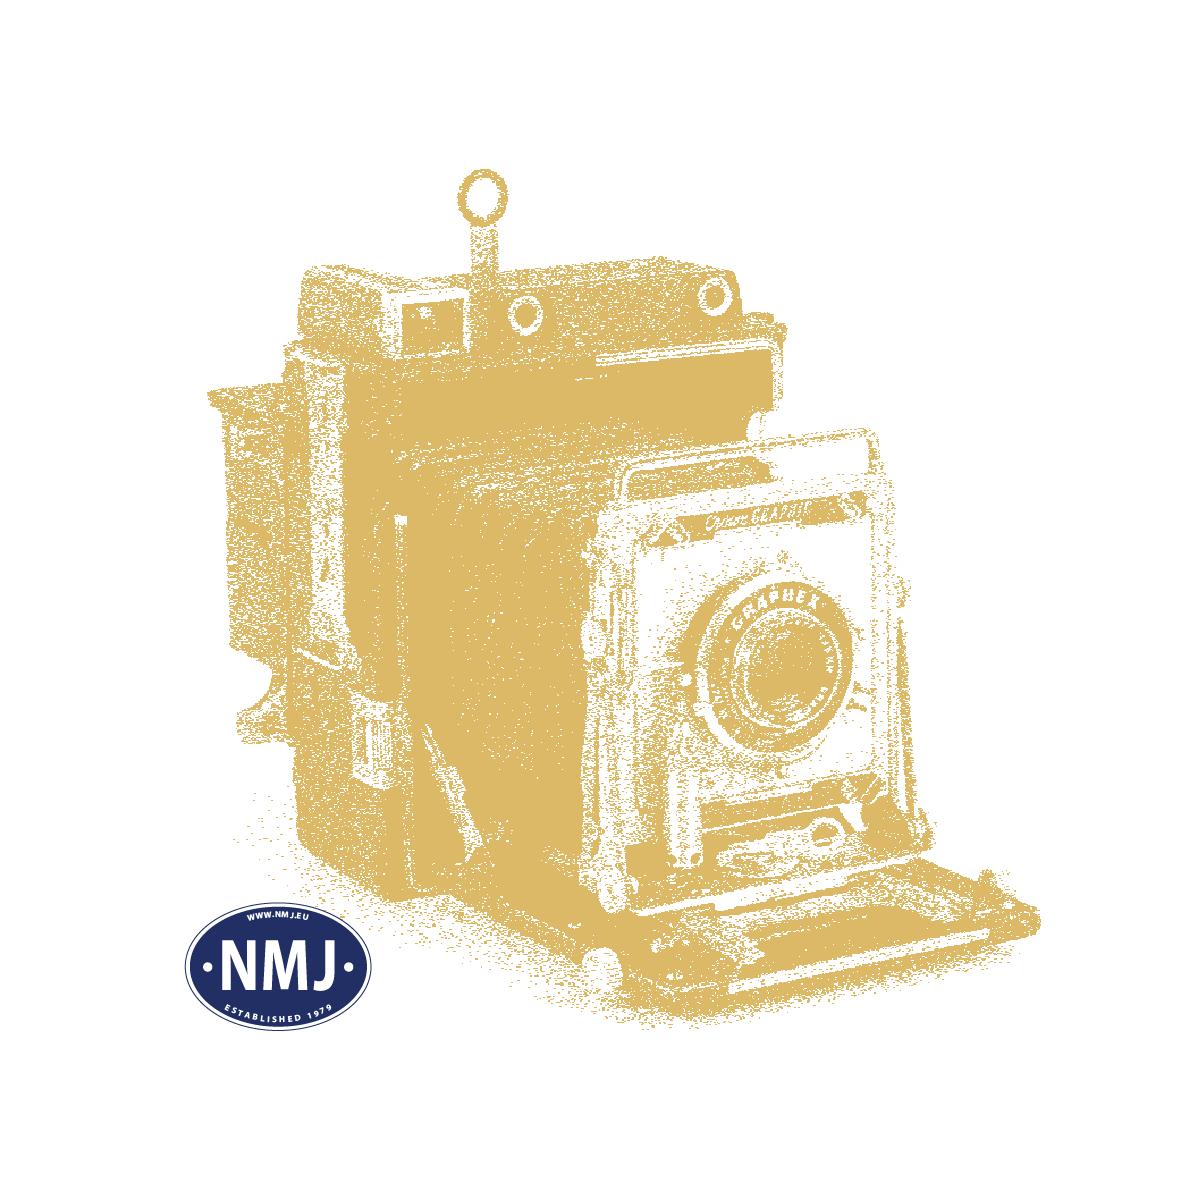 MIG0010 - RAL 7028 Dunkelgelb (Mid War), Akrylmaling (17 ml)